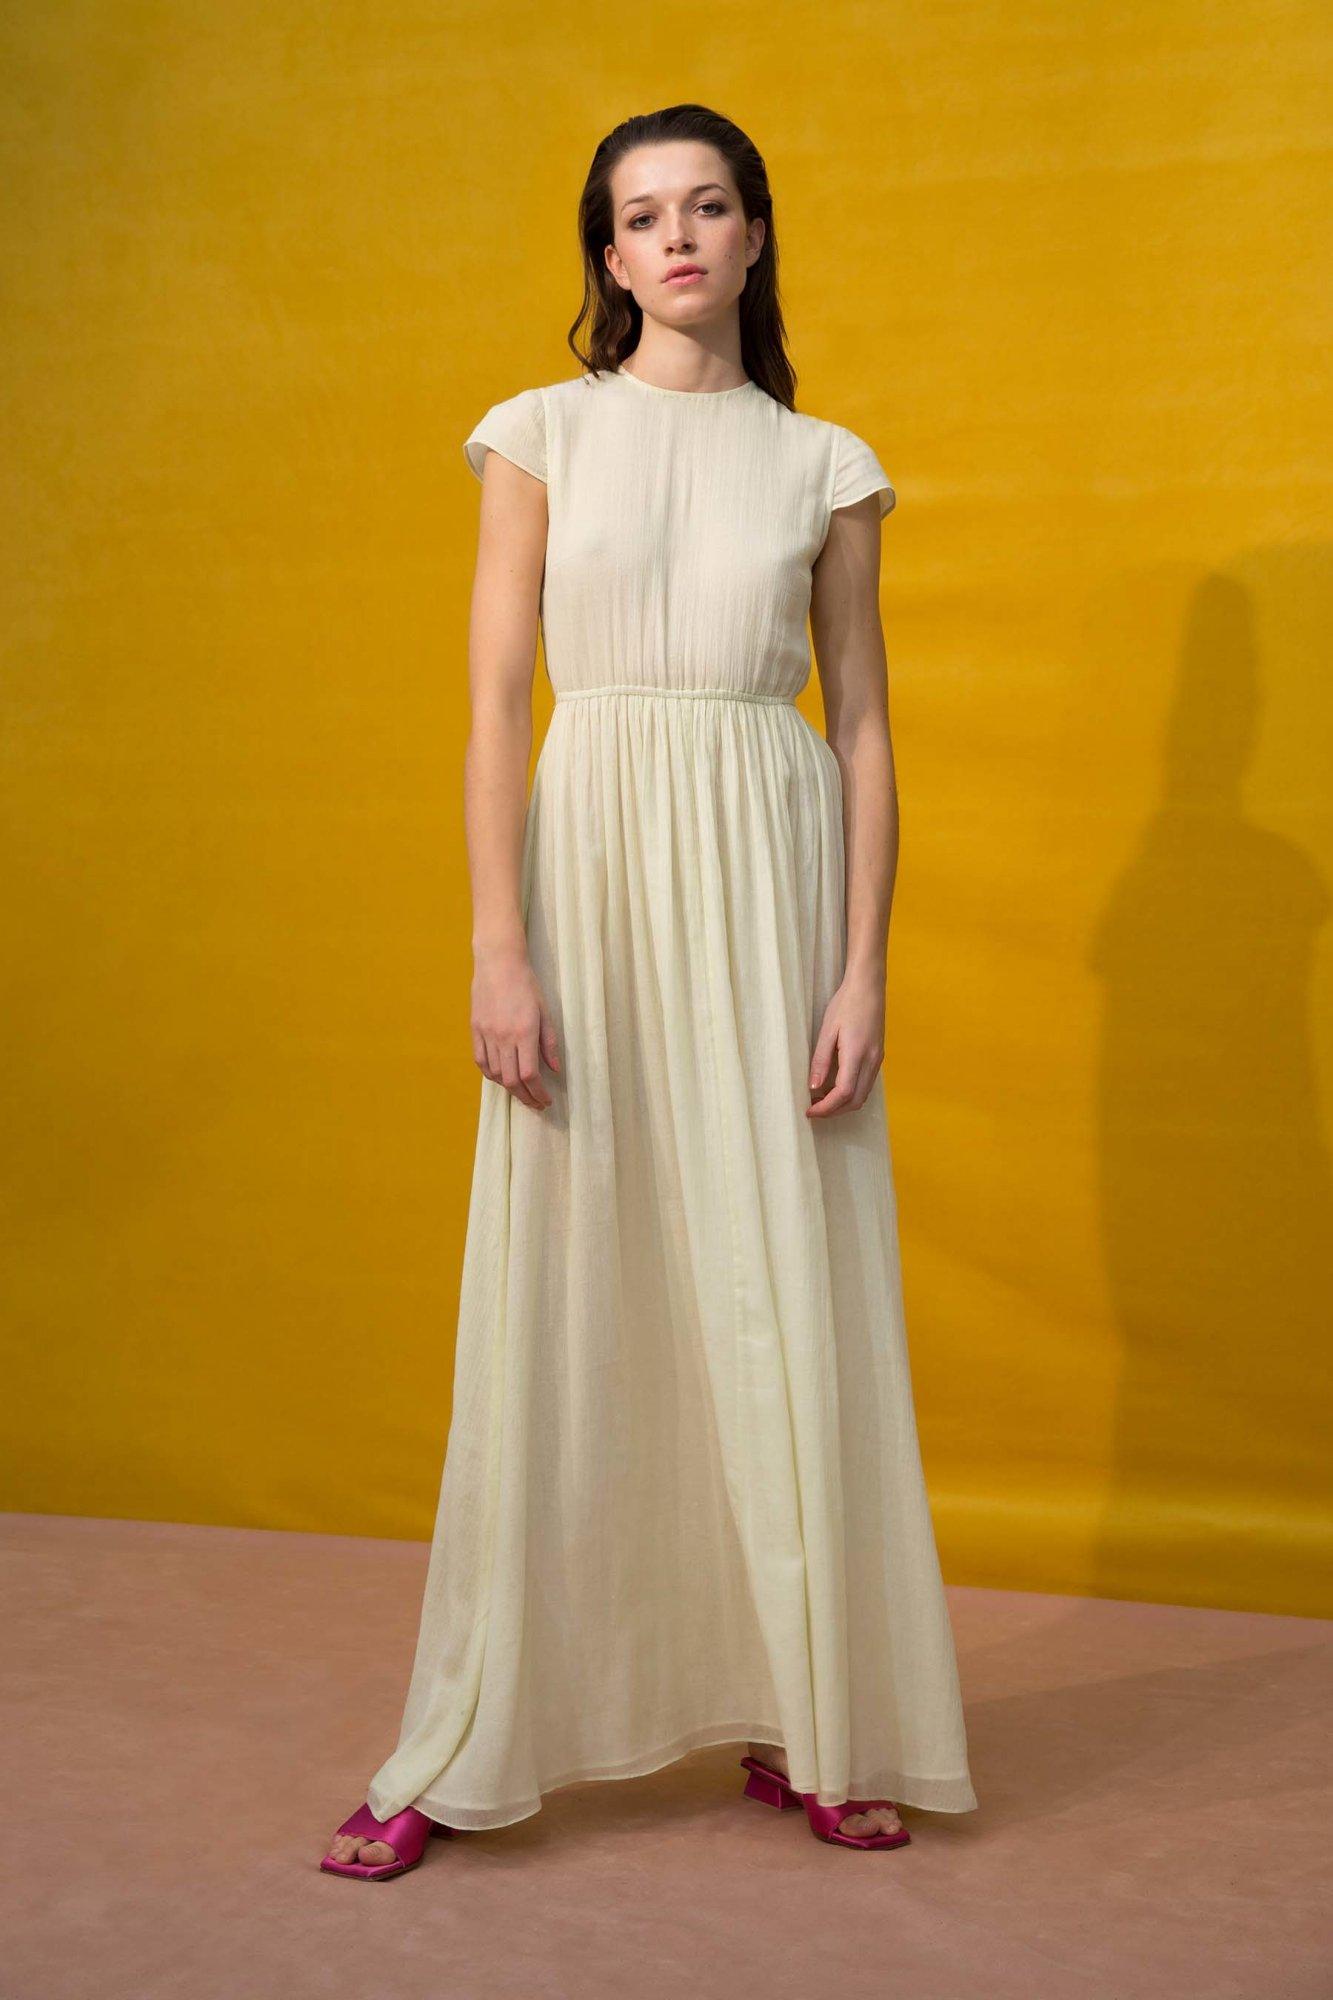 Long miami dress | Cathrine Hammel